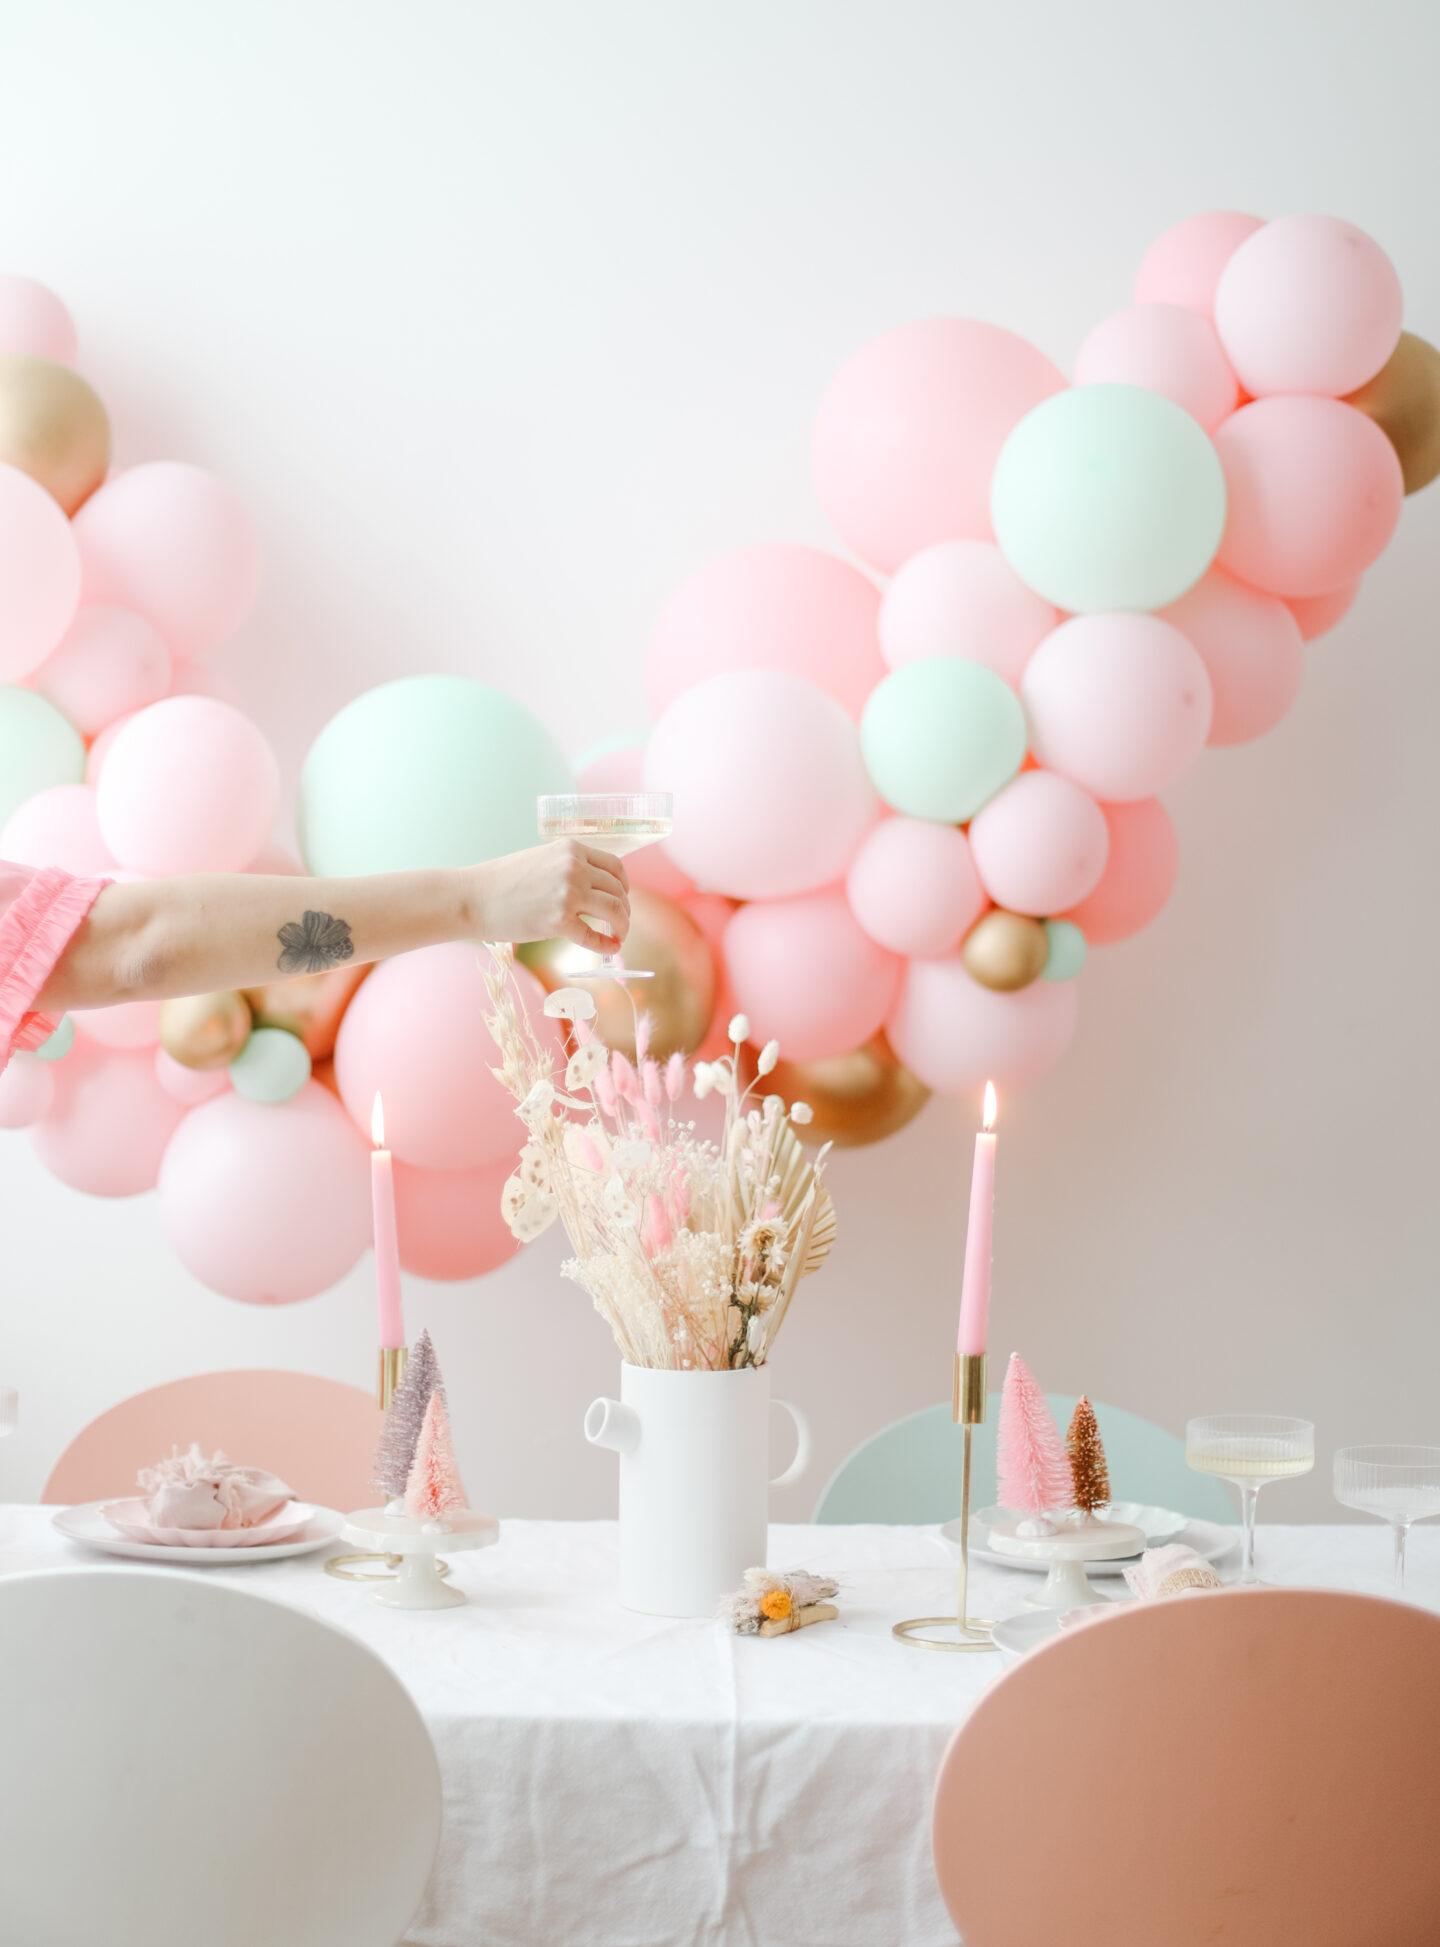 Christmas Decor with a pink ballon garland